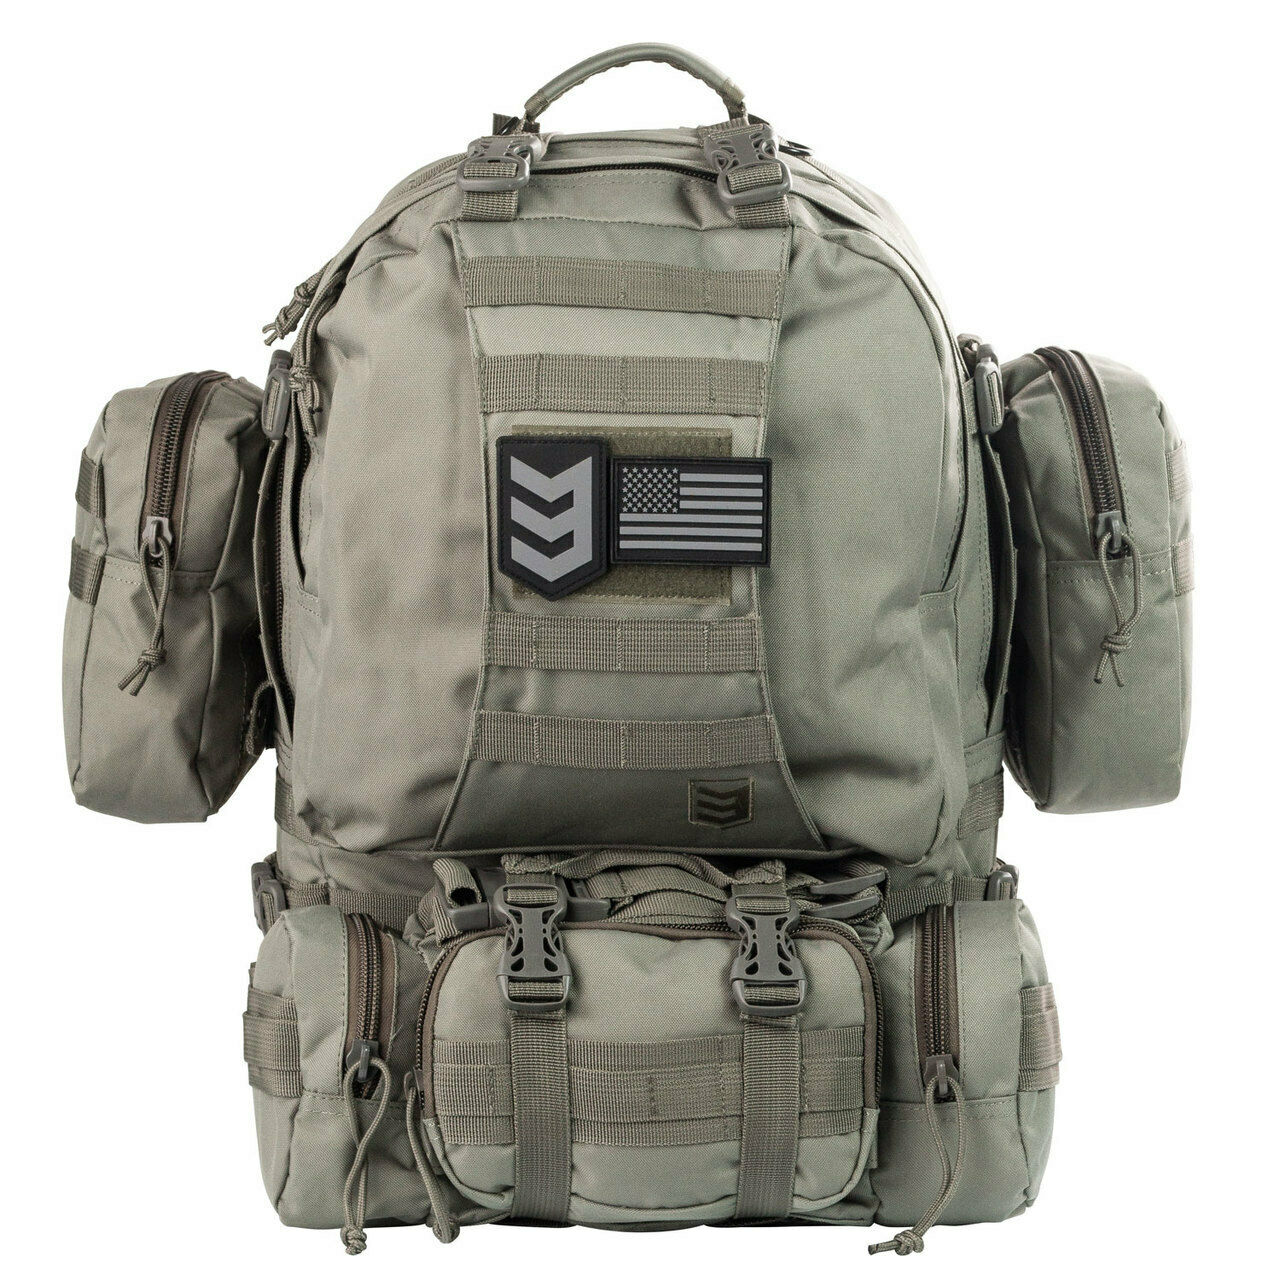 3v Gear Paratus 3 Day Operator S